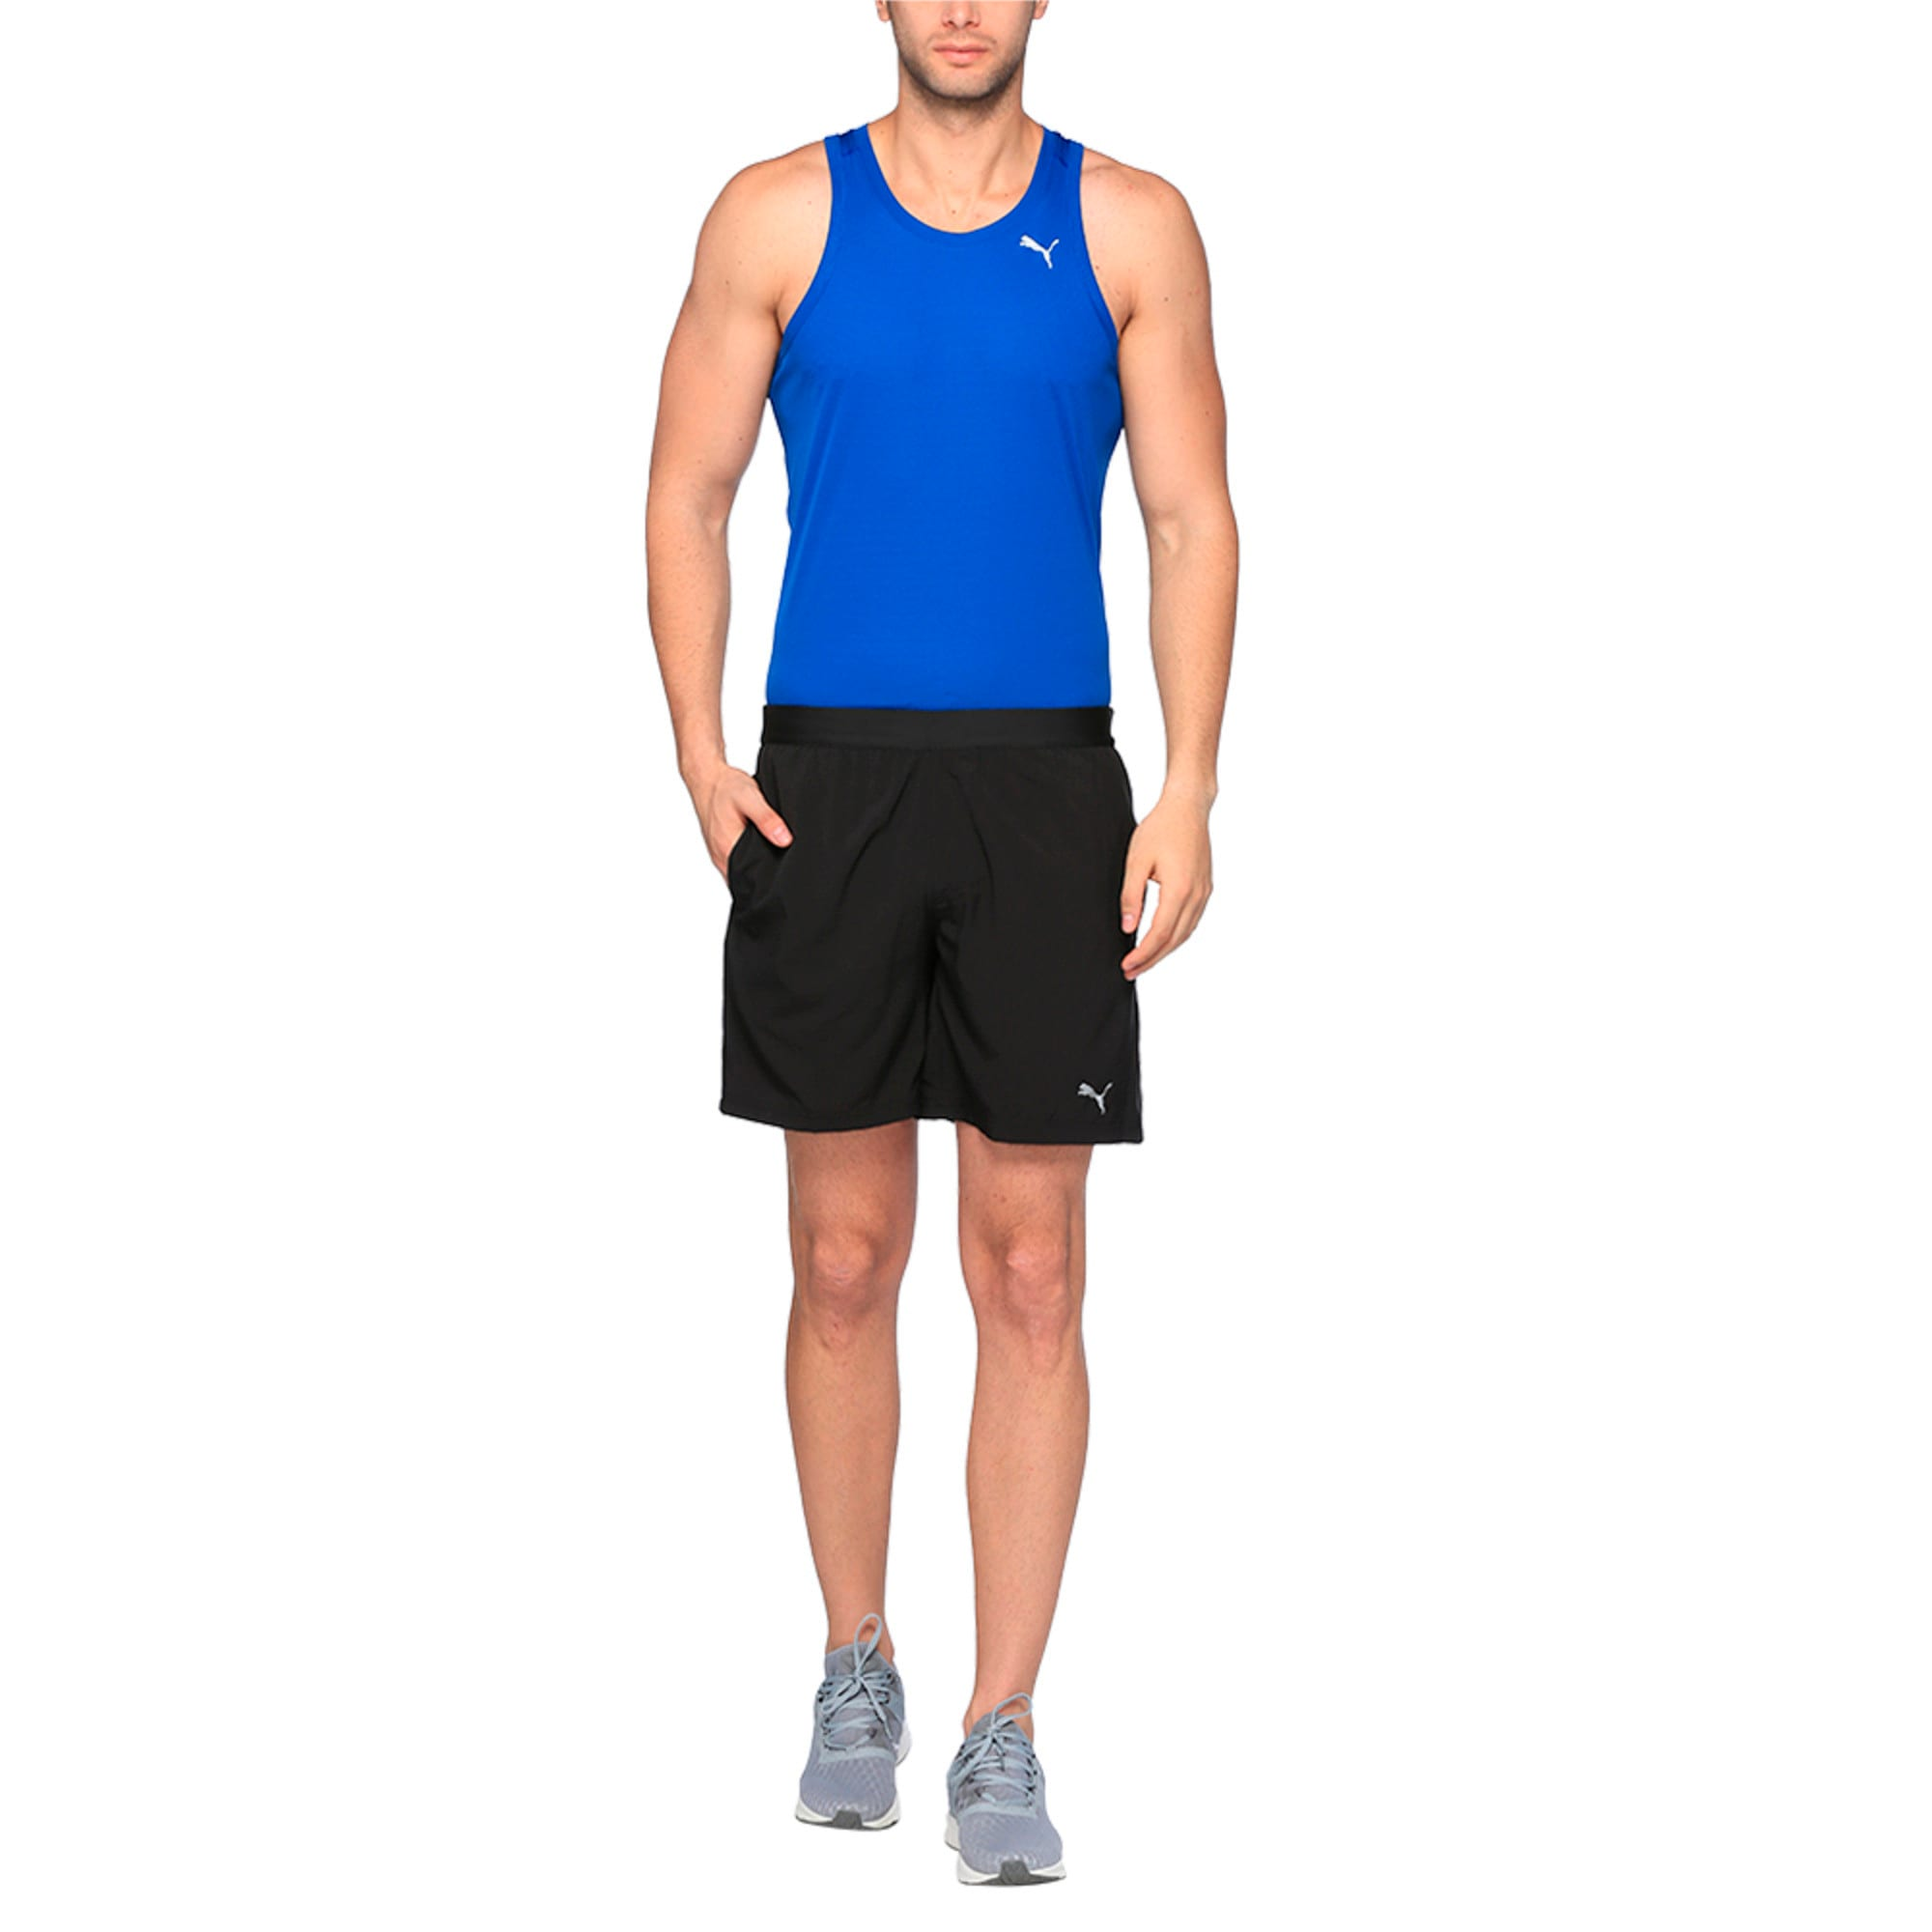 Thumbnail 3 of Running Men's Pace Shorts, Puma Black, medium-IND